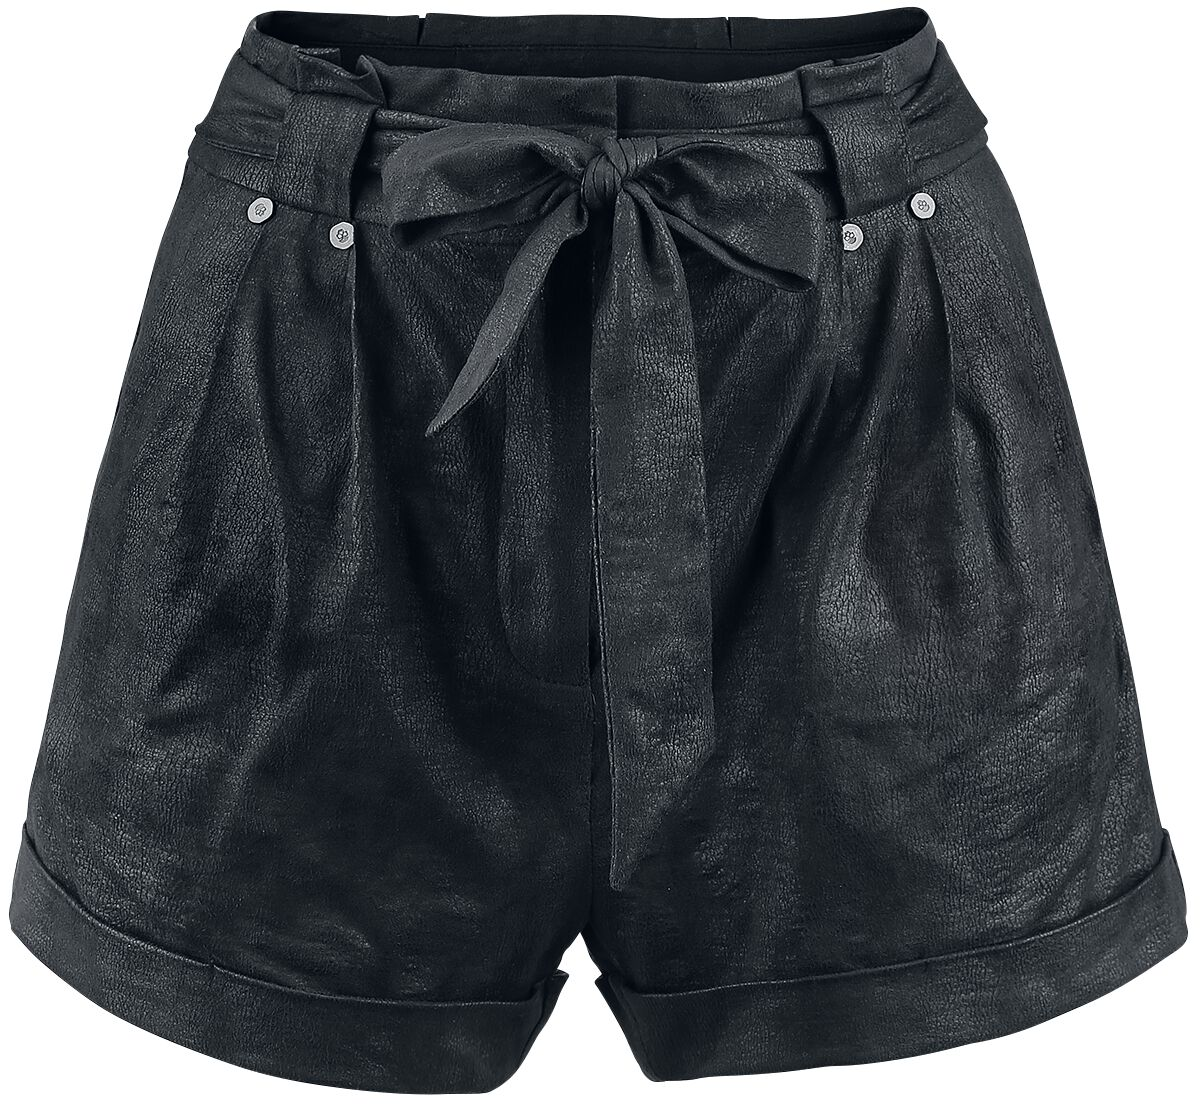 Image of   Rock Rebel by EMP Fake Suede Leather Shorts Girlie shorts sort